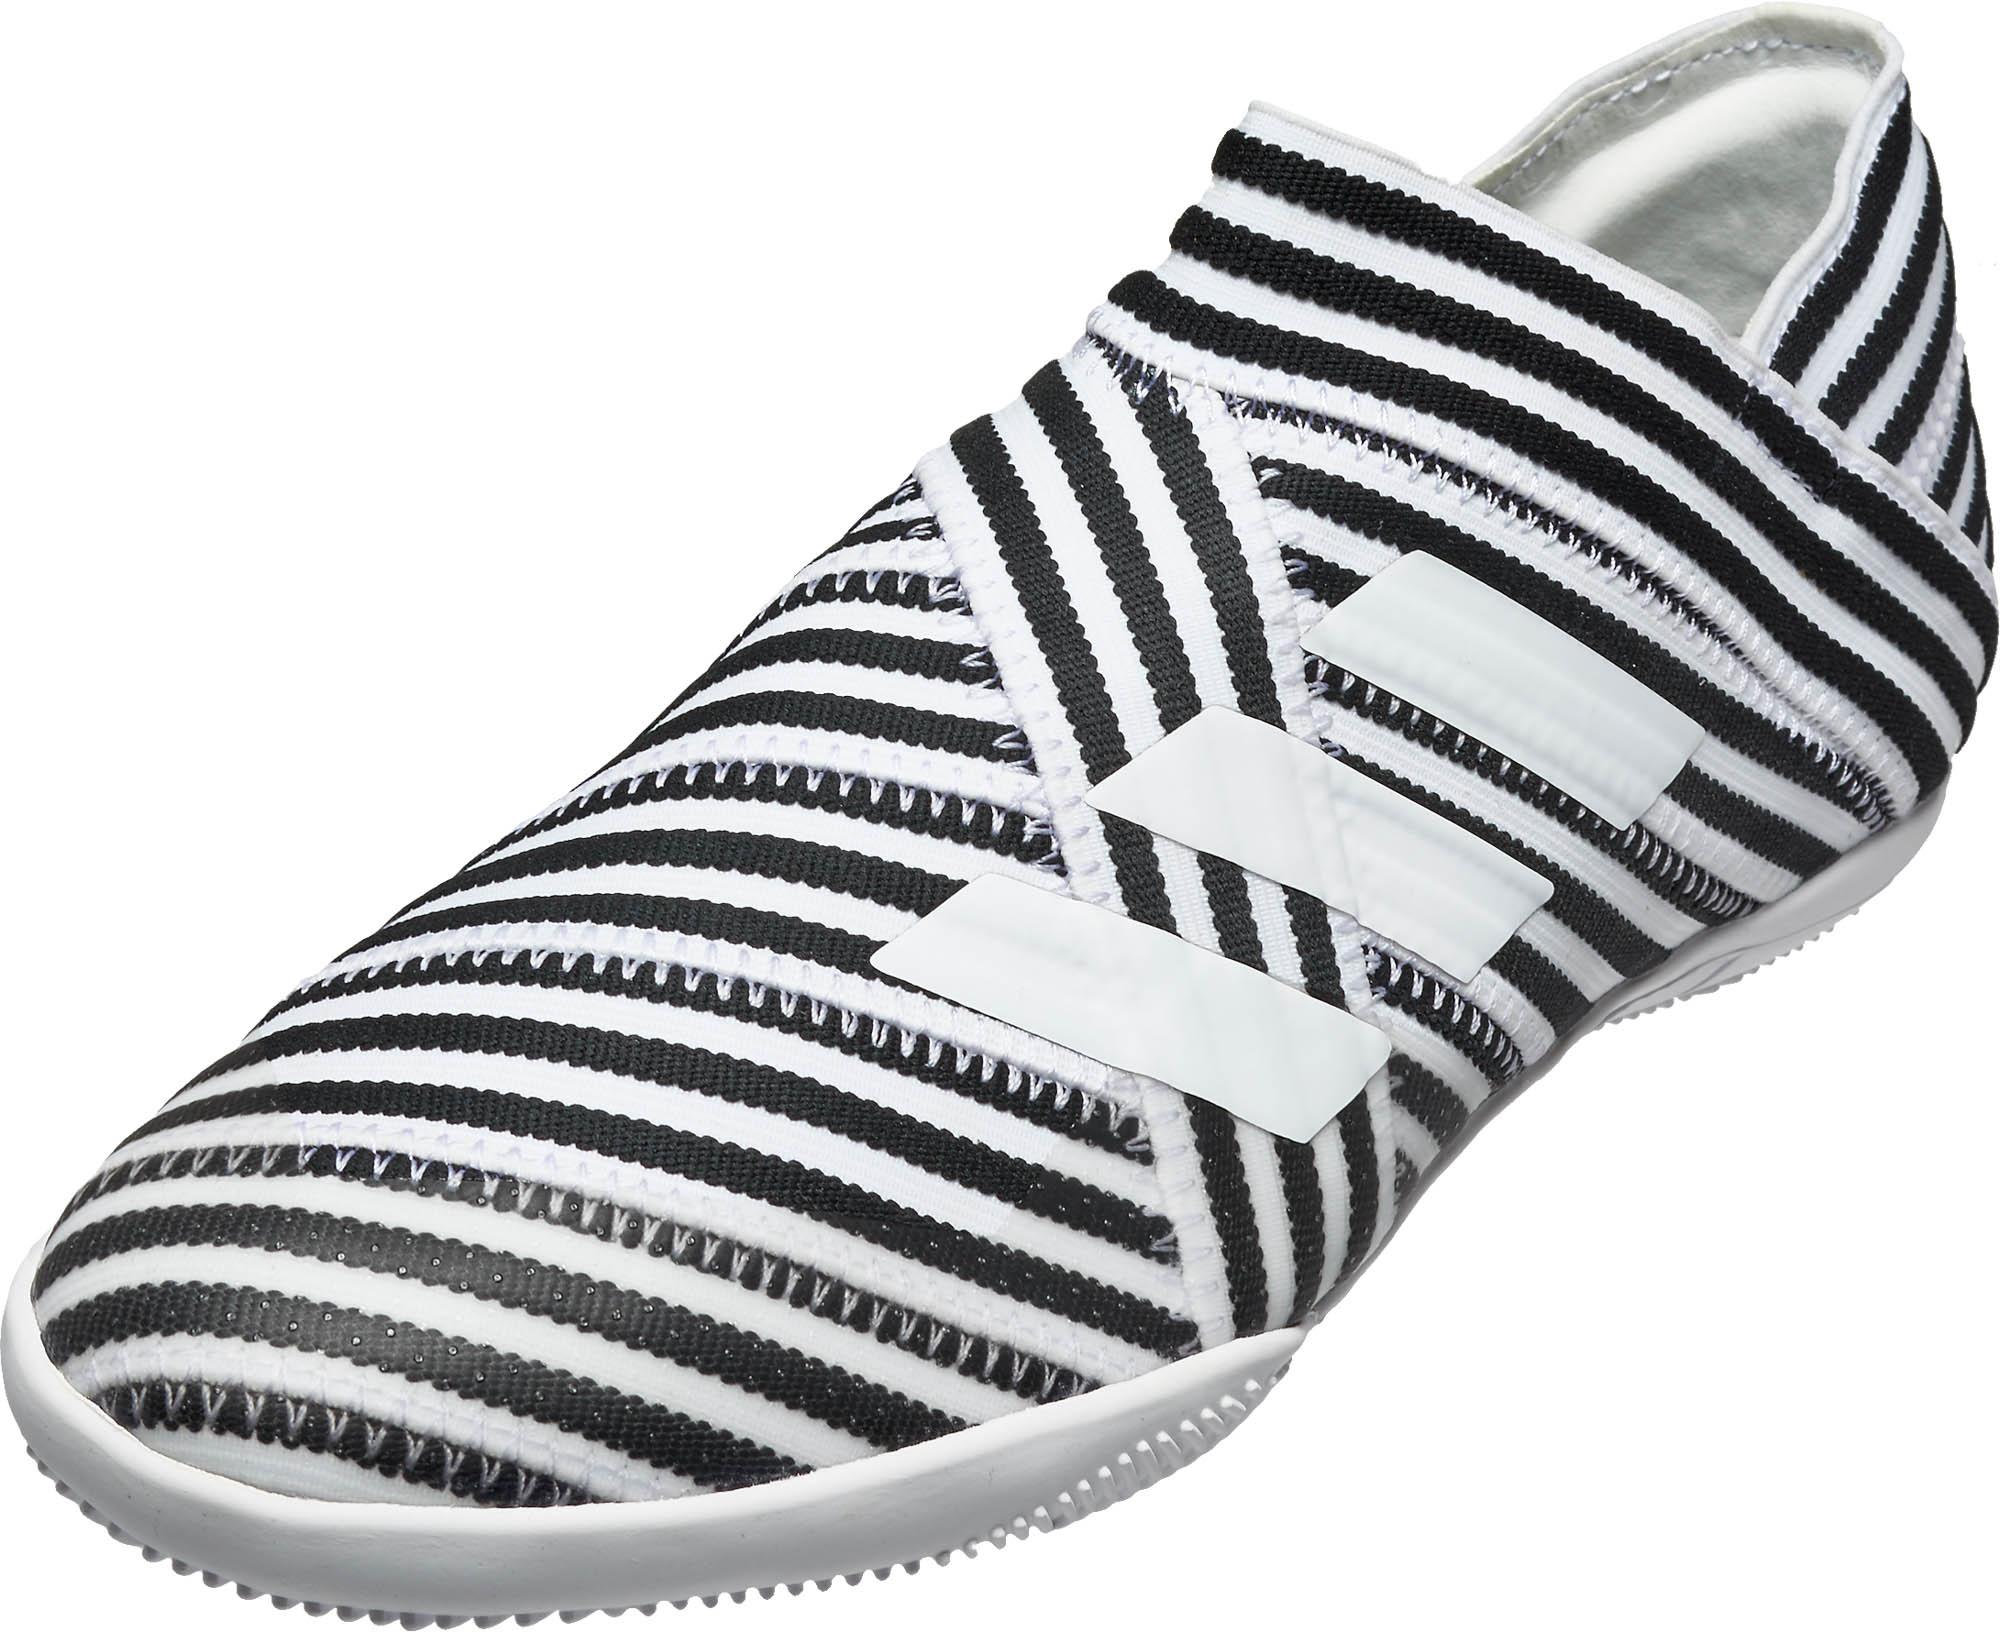 adidas Kids Nemeziz Tango 17+ 360Agility IN - White   Black - Soccer ... 5dd85ea5c682